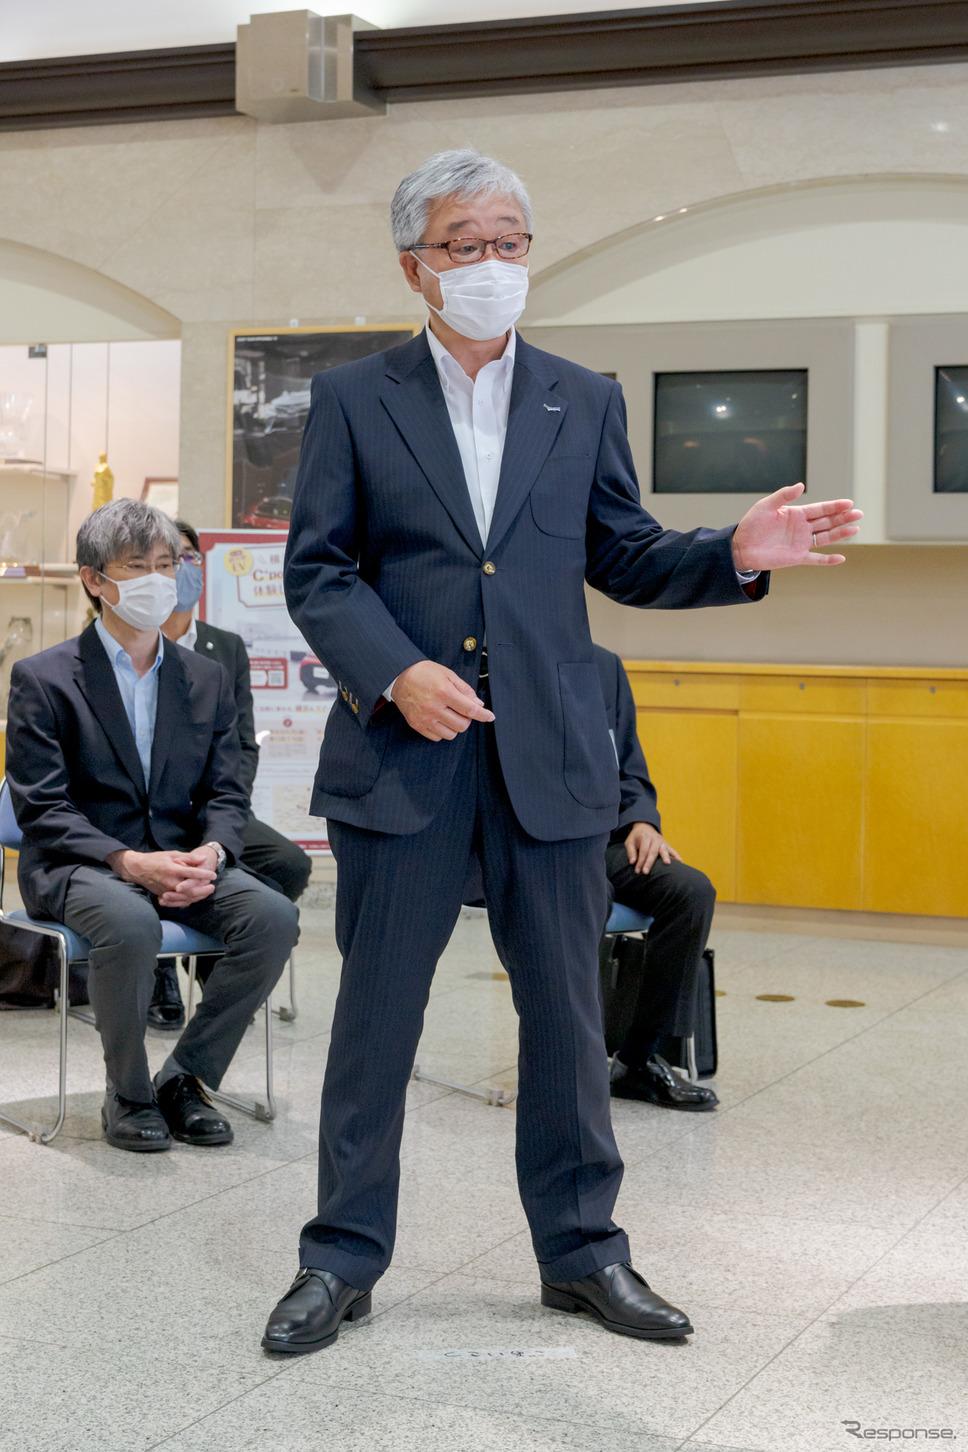 株式会社トヨタレンタリース横浜常務取締役 林良和氏。《写真撮影 関口敬文》